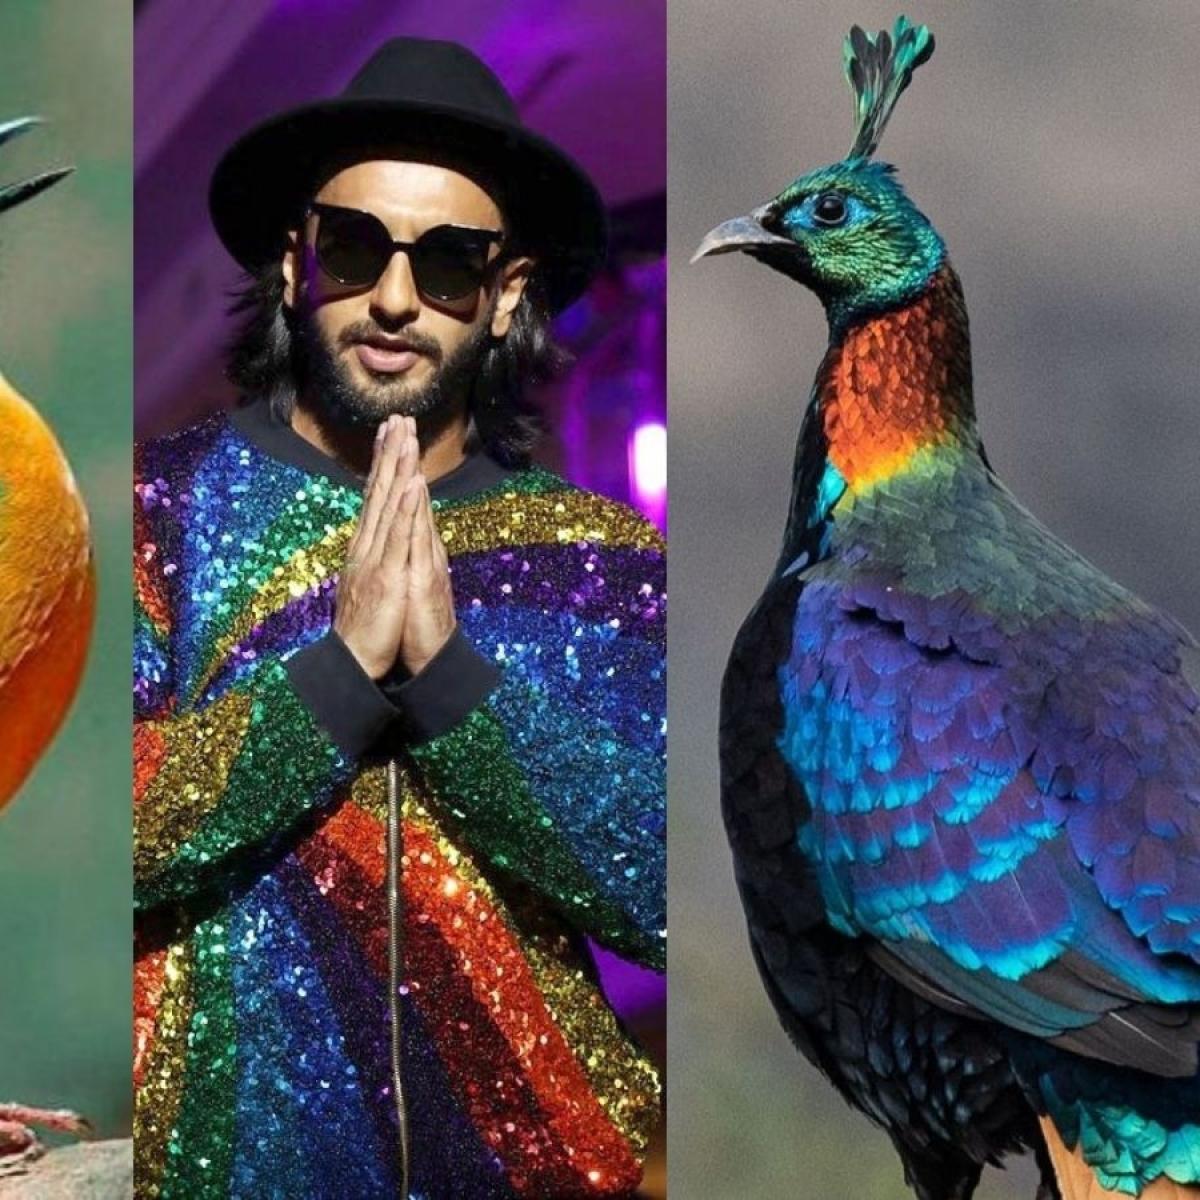 Twitter user reimagines Ranveer Singh as colourful Indian birds, pictures go viral